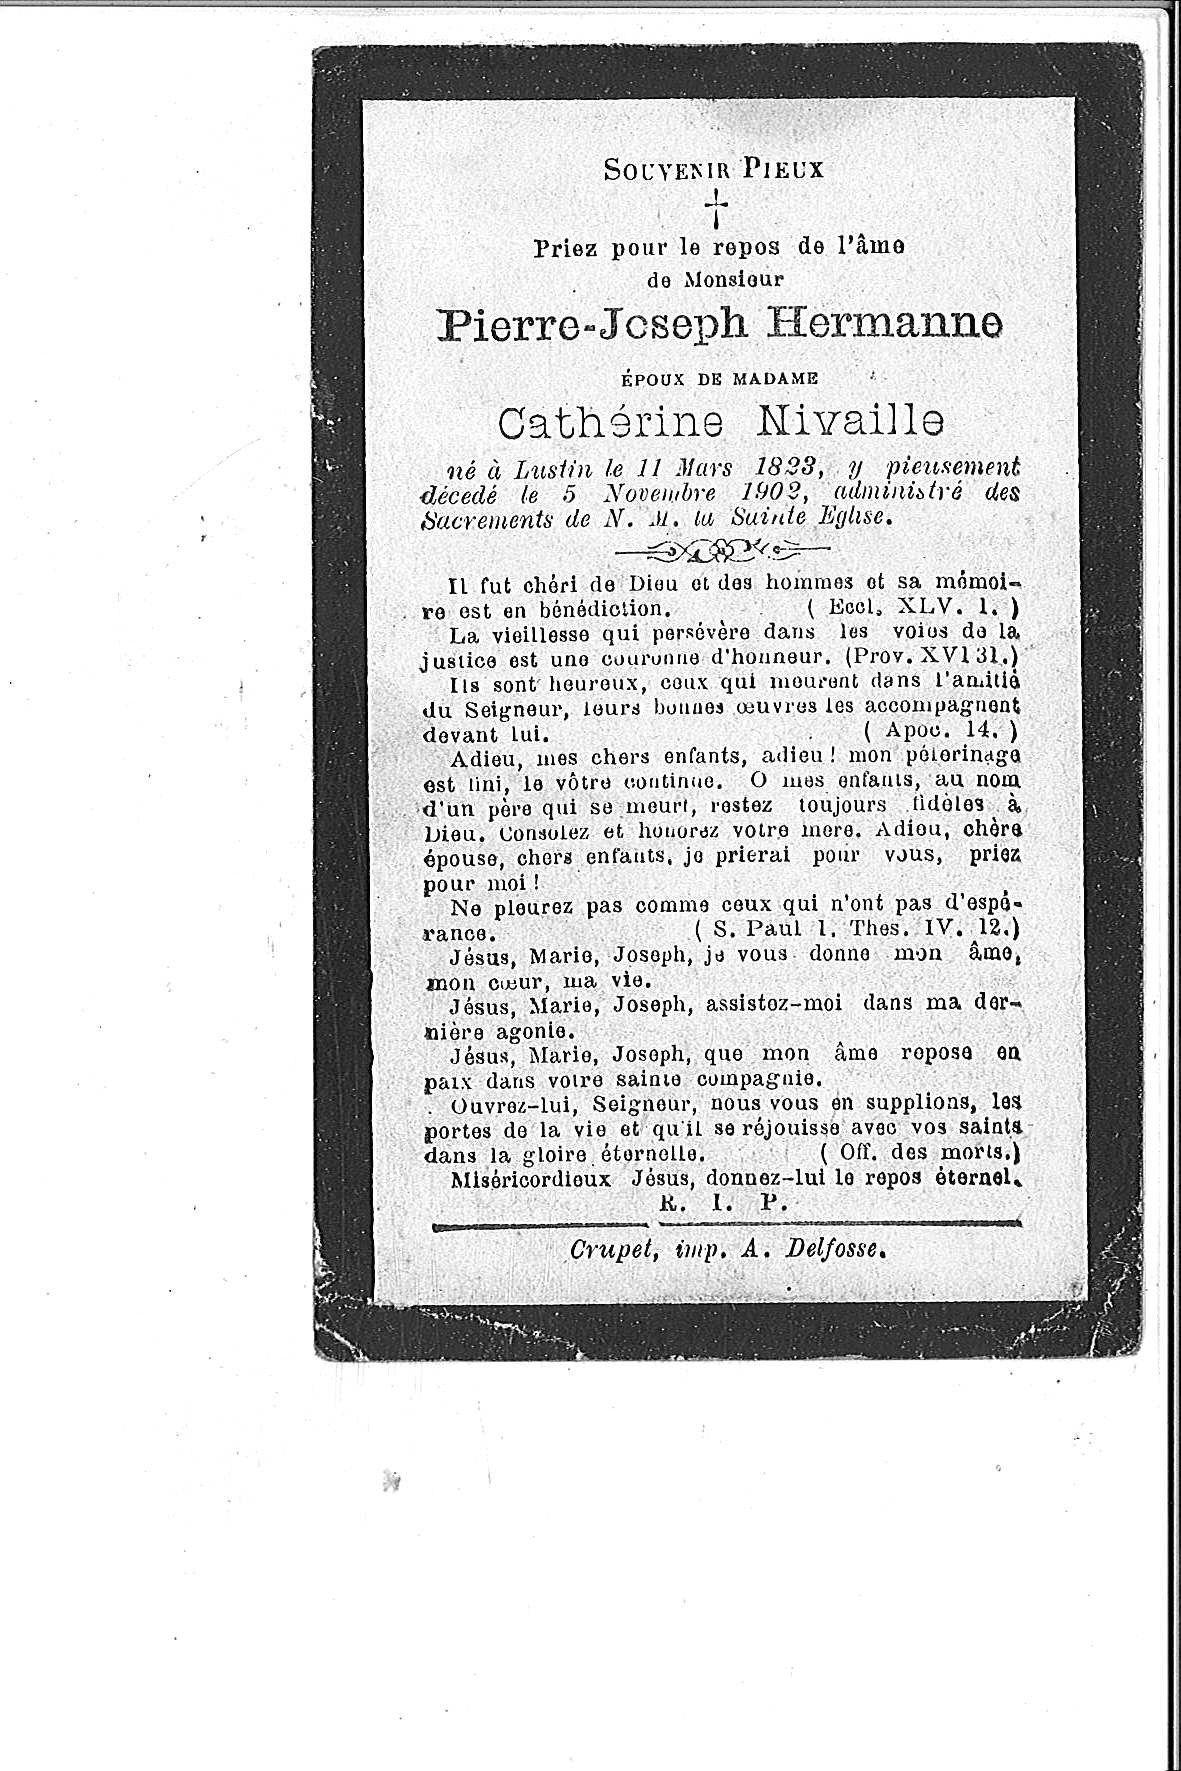 Pierre-Joseph(1902)20150311141146_00030.jpg